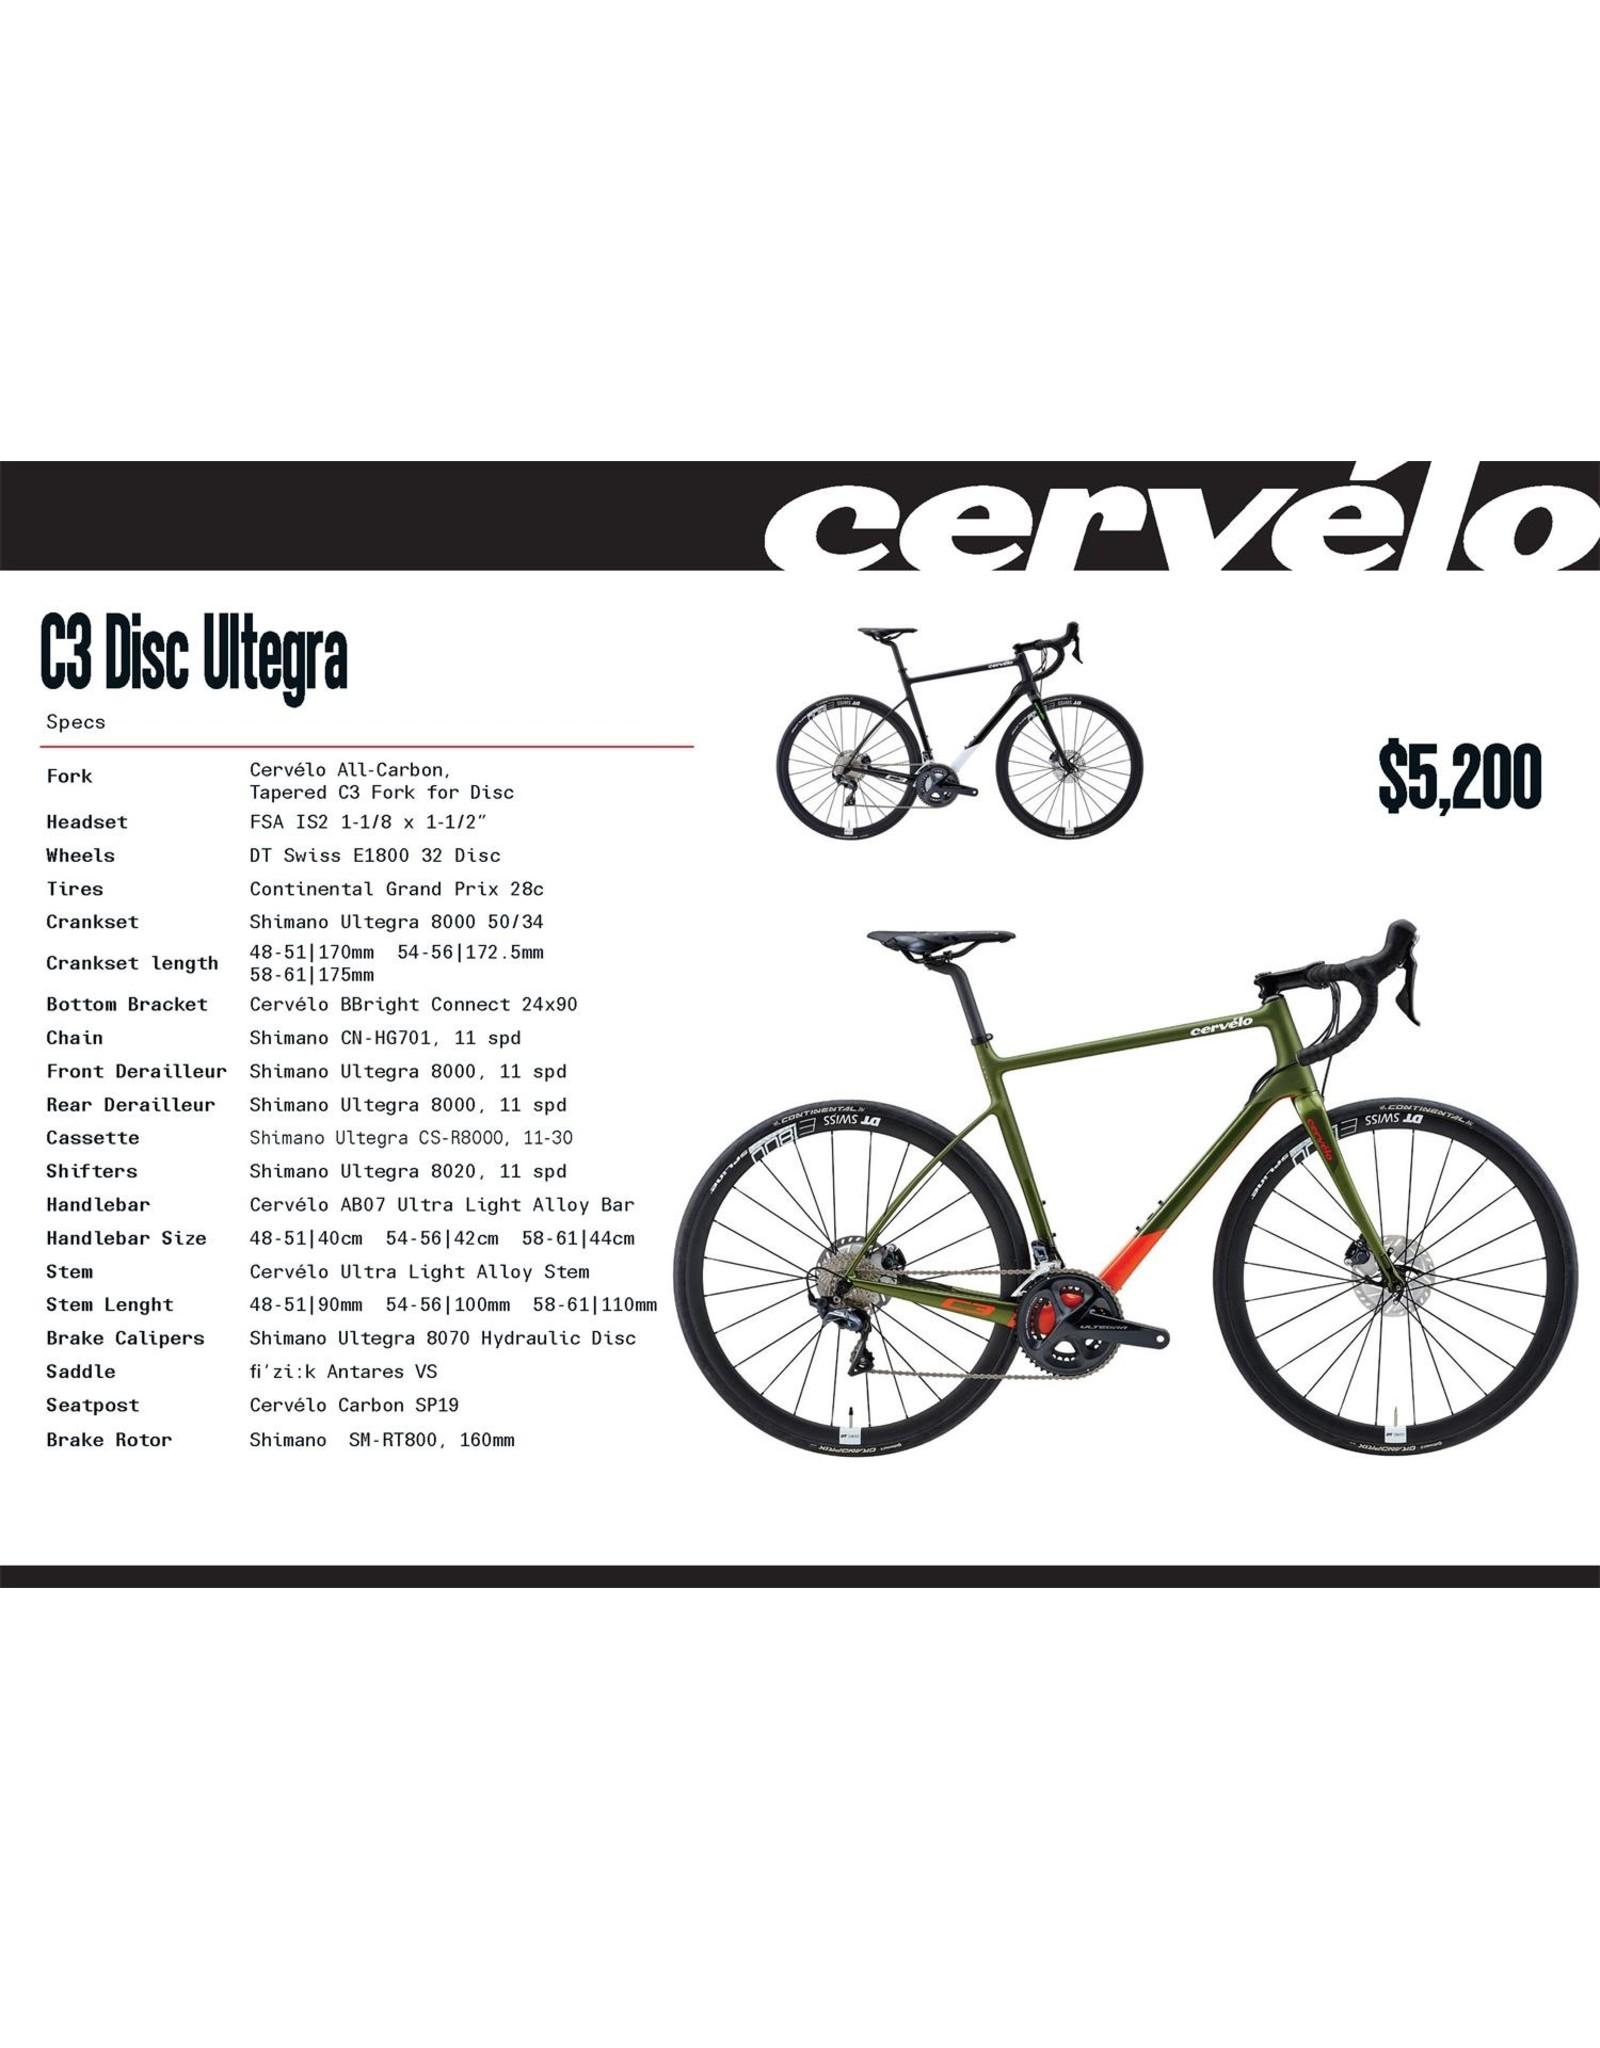 CERVELO 20 C3 RRP $5200 ULTEGRA